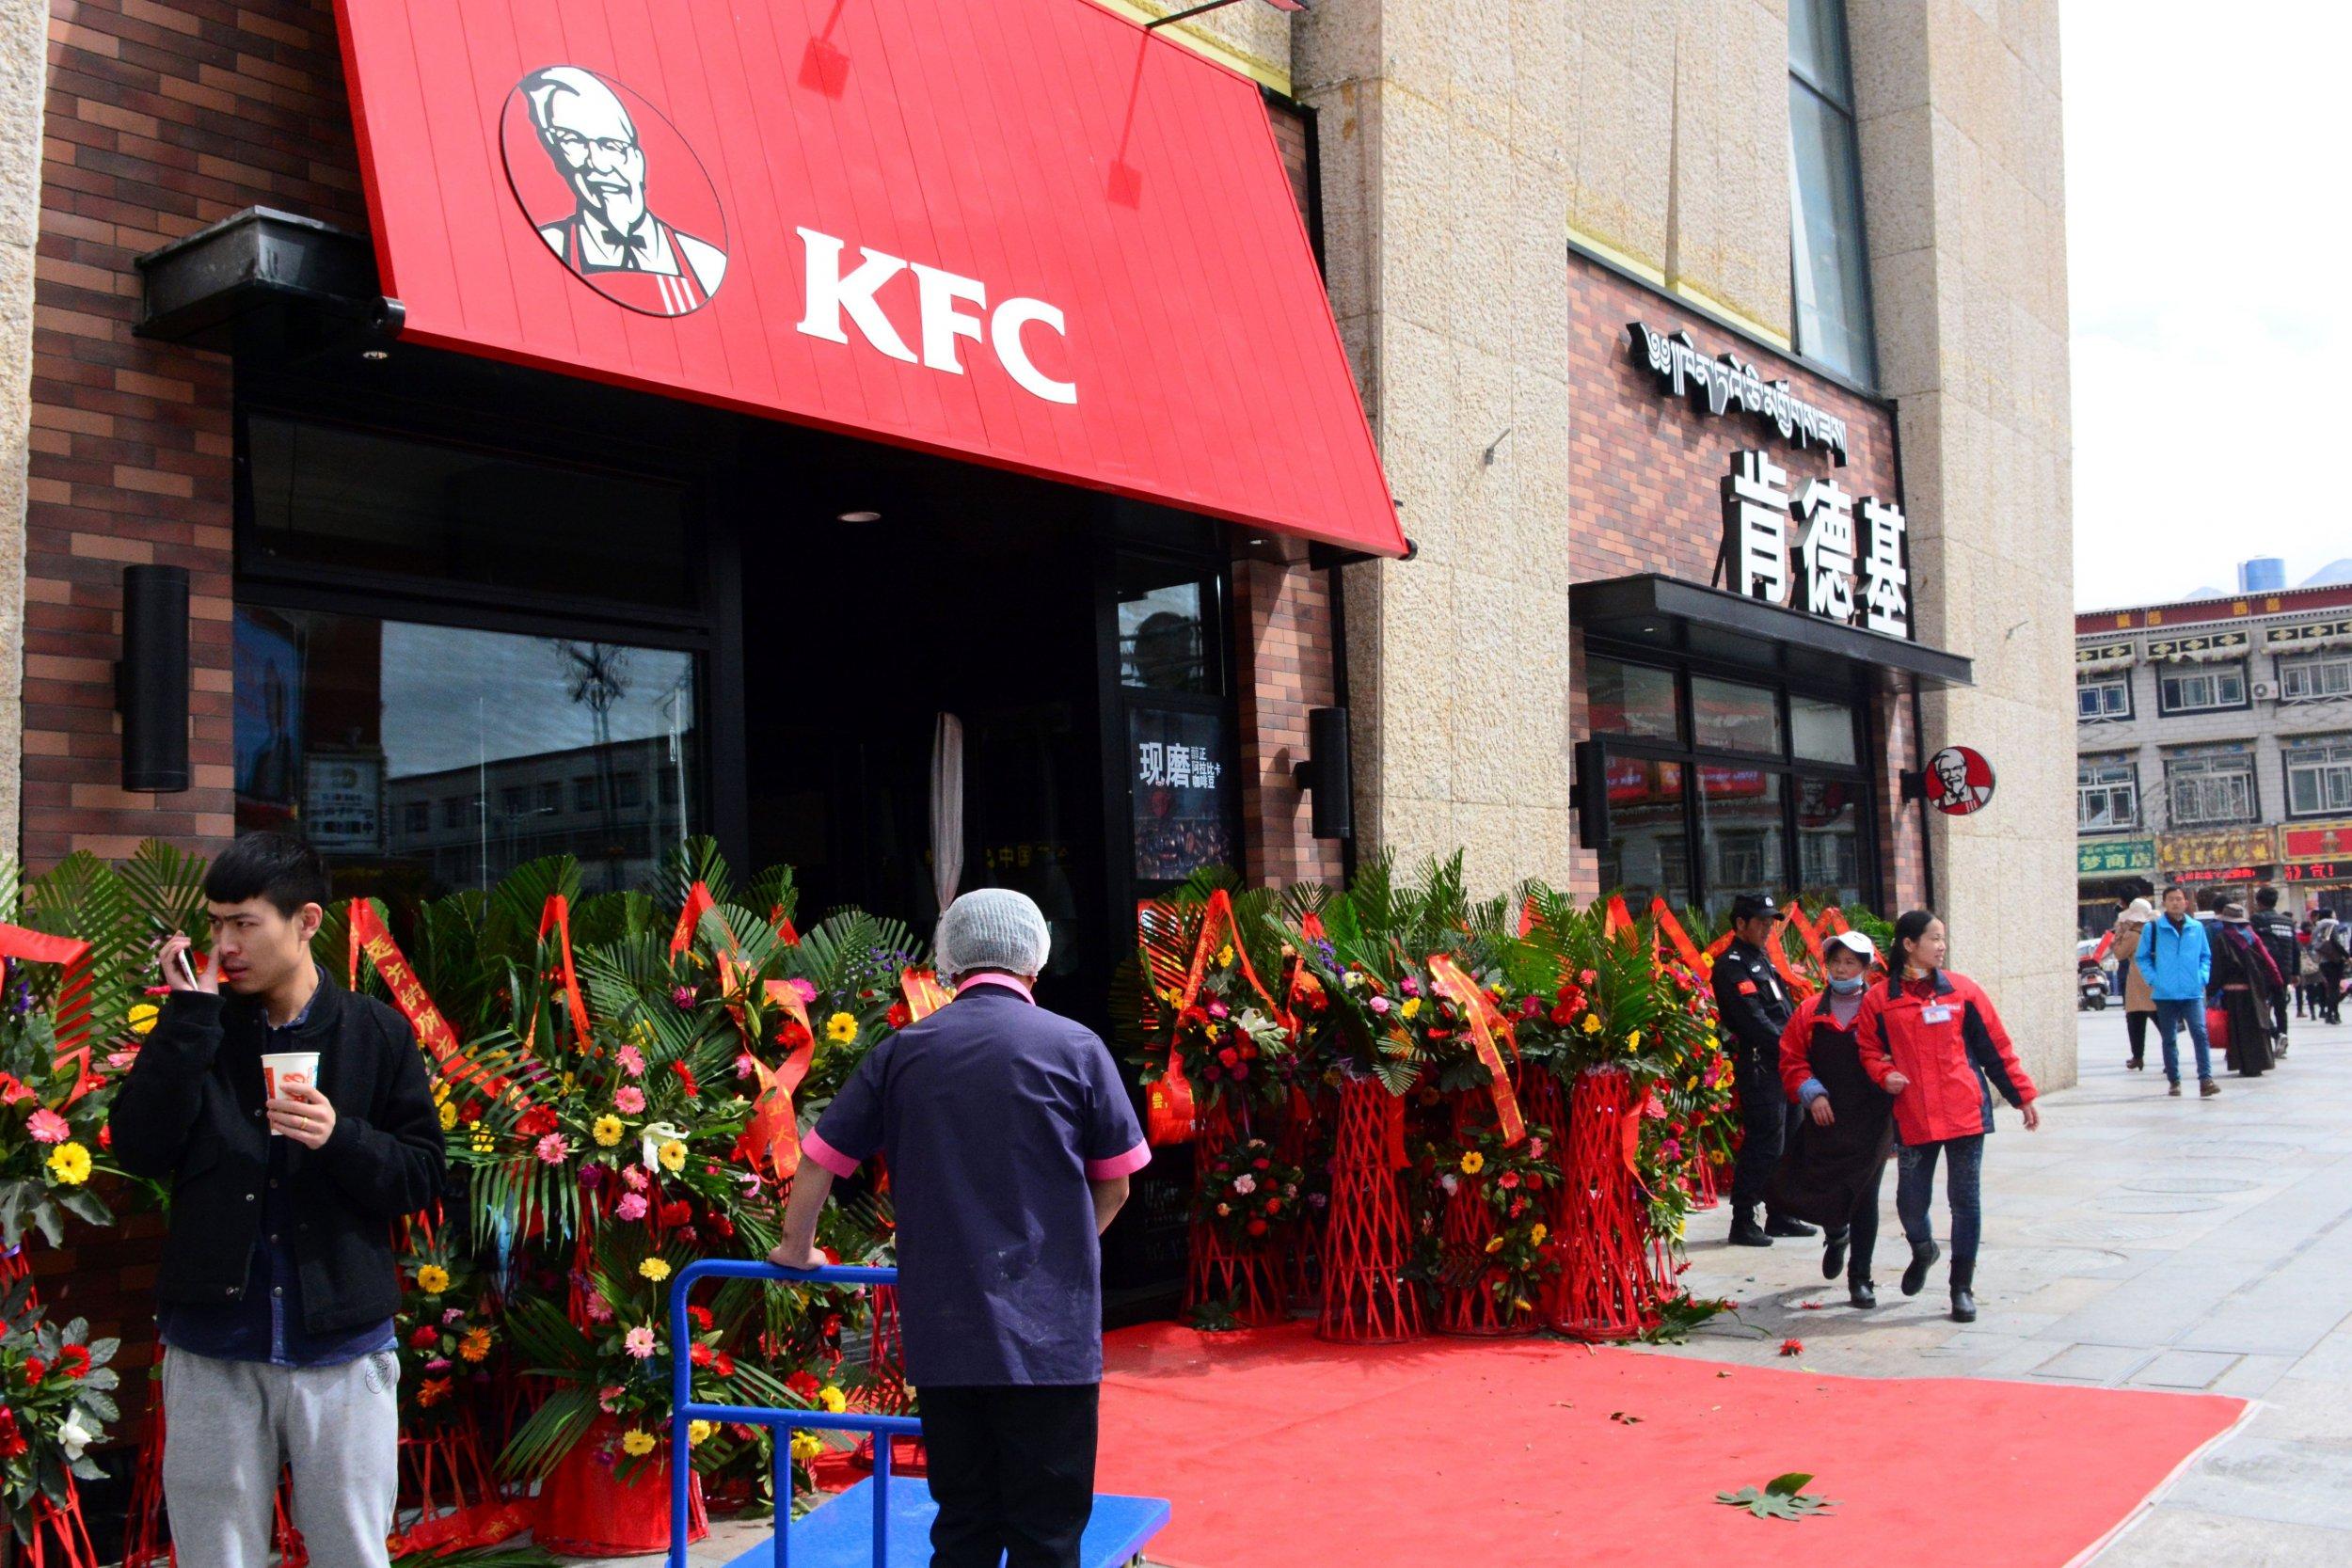 A KFC branch in Lhasa, Tibet.